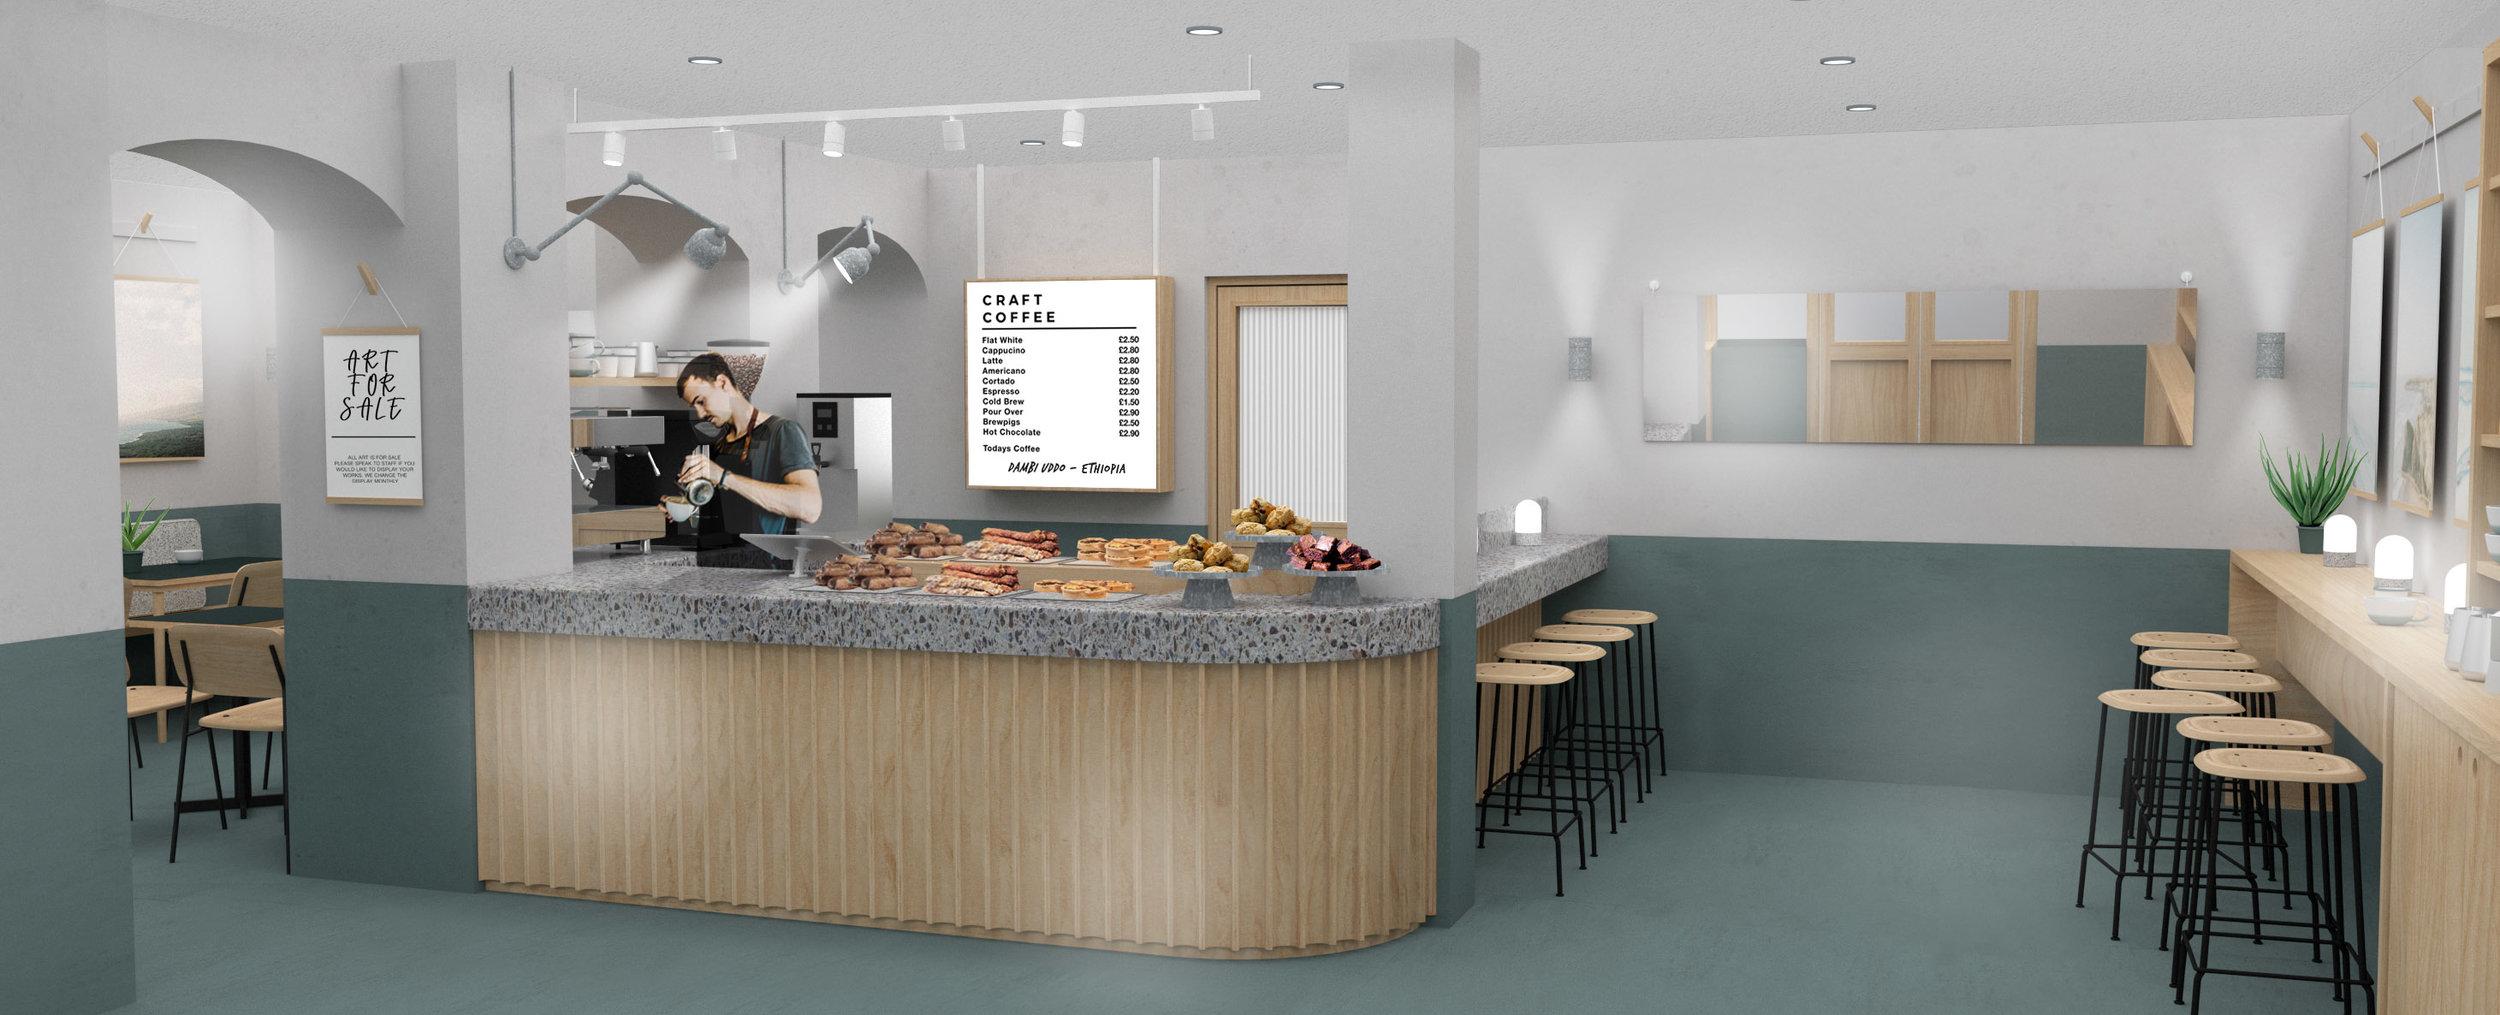 lunarlunar_interior_design_cafe_craft_coffee_banquette_hastings_Counter.jpg